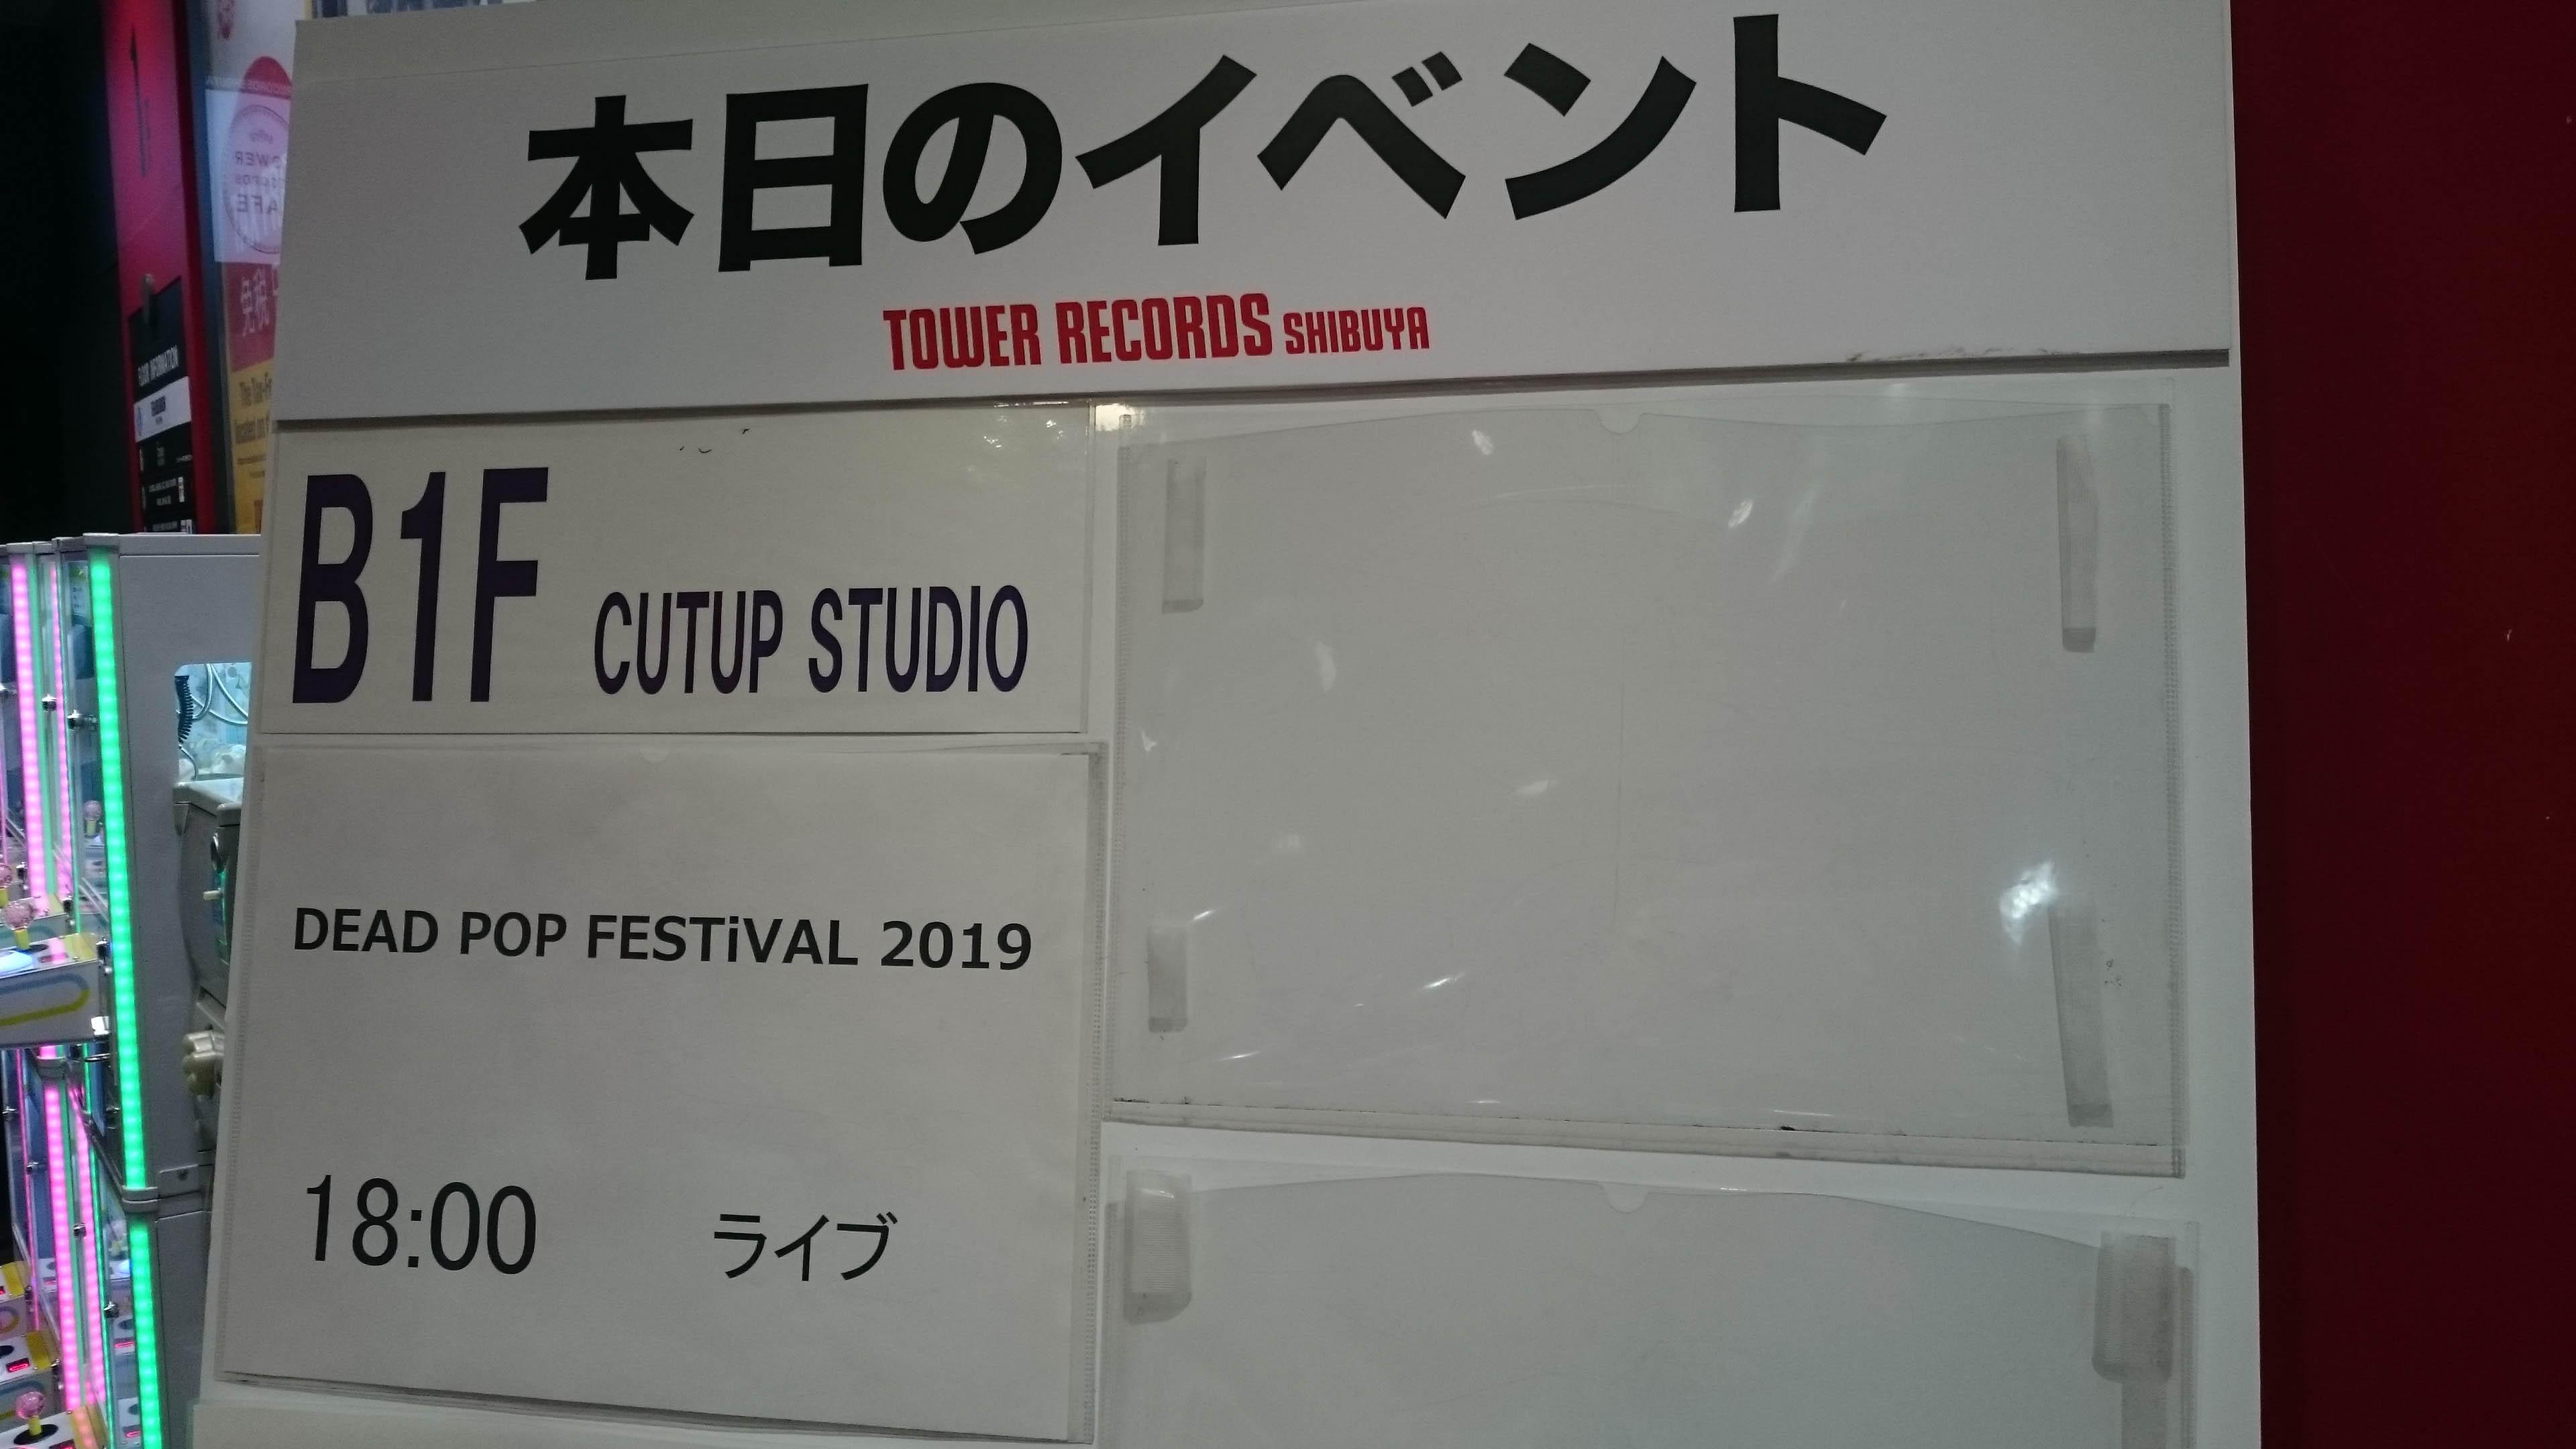 "DEAD POP FESTiVAL 2019 ""CHAOS STAGE"" AUDITIONはDPF2019に行くなら絶対にチェックすべきイベント"